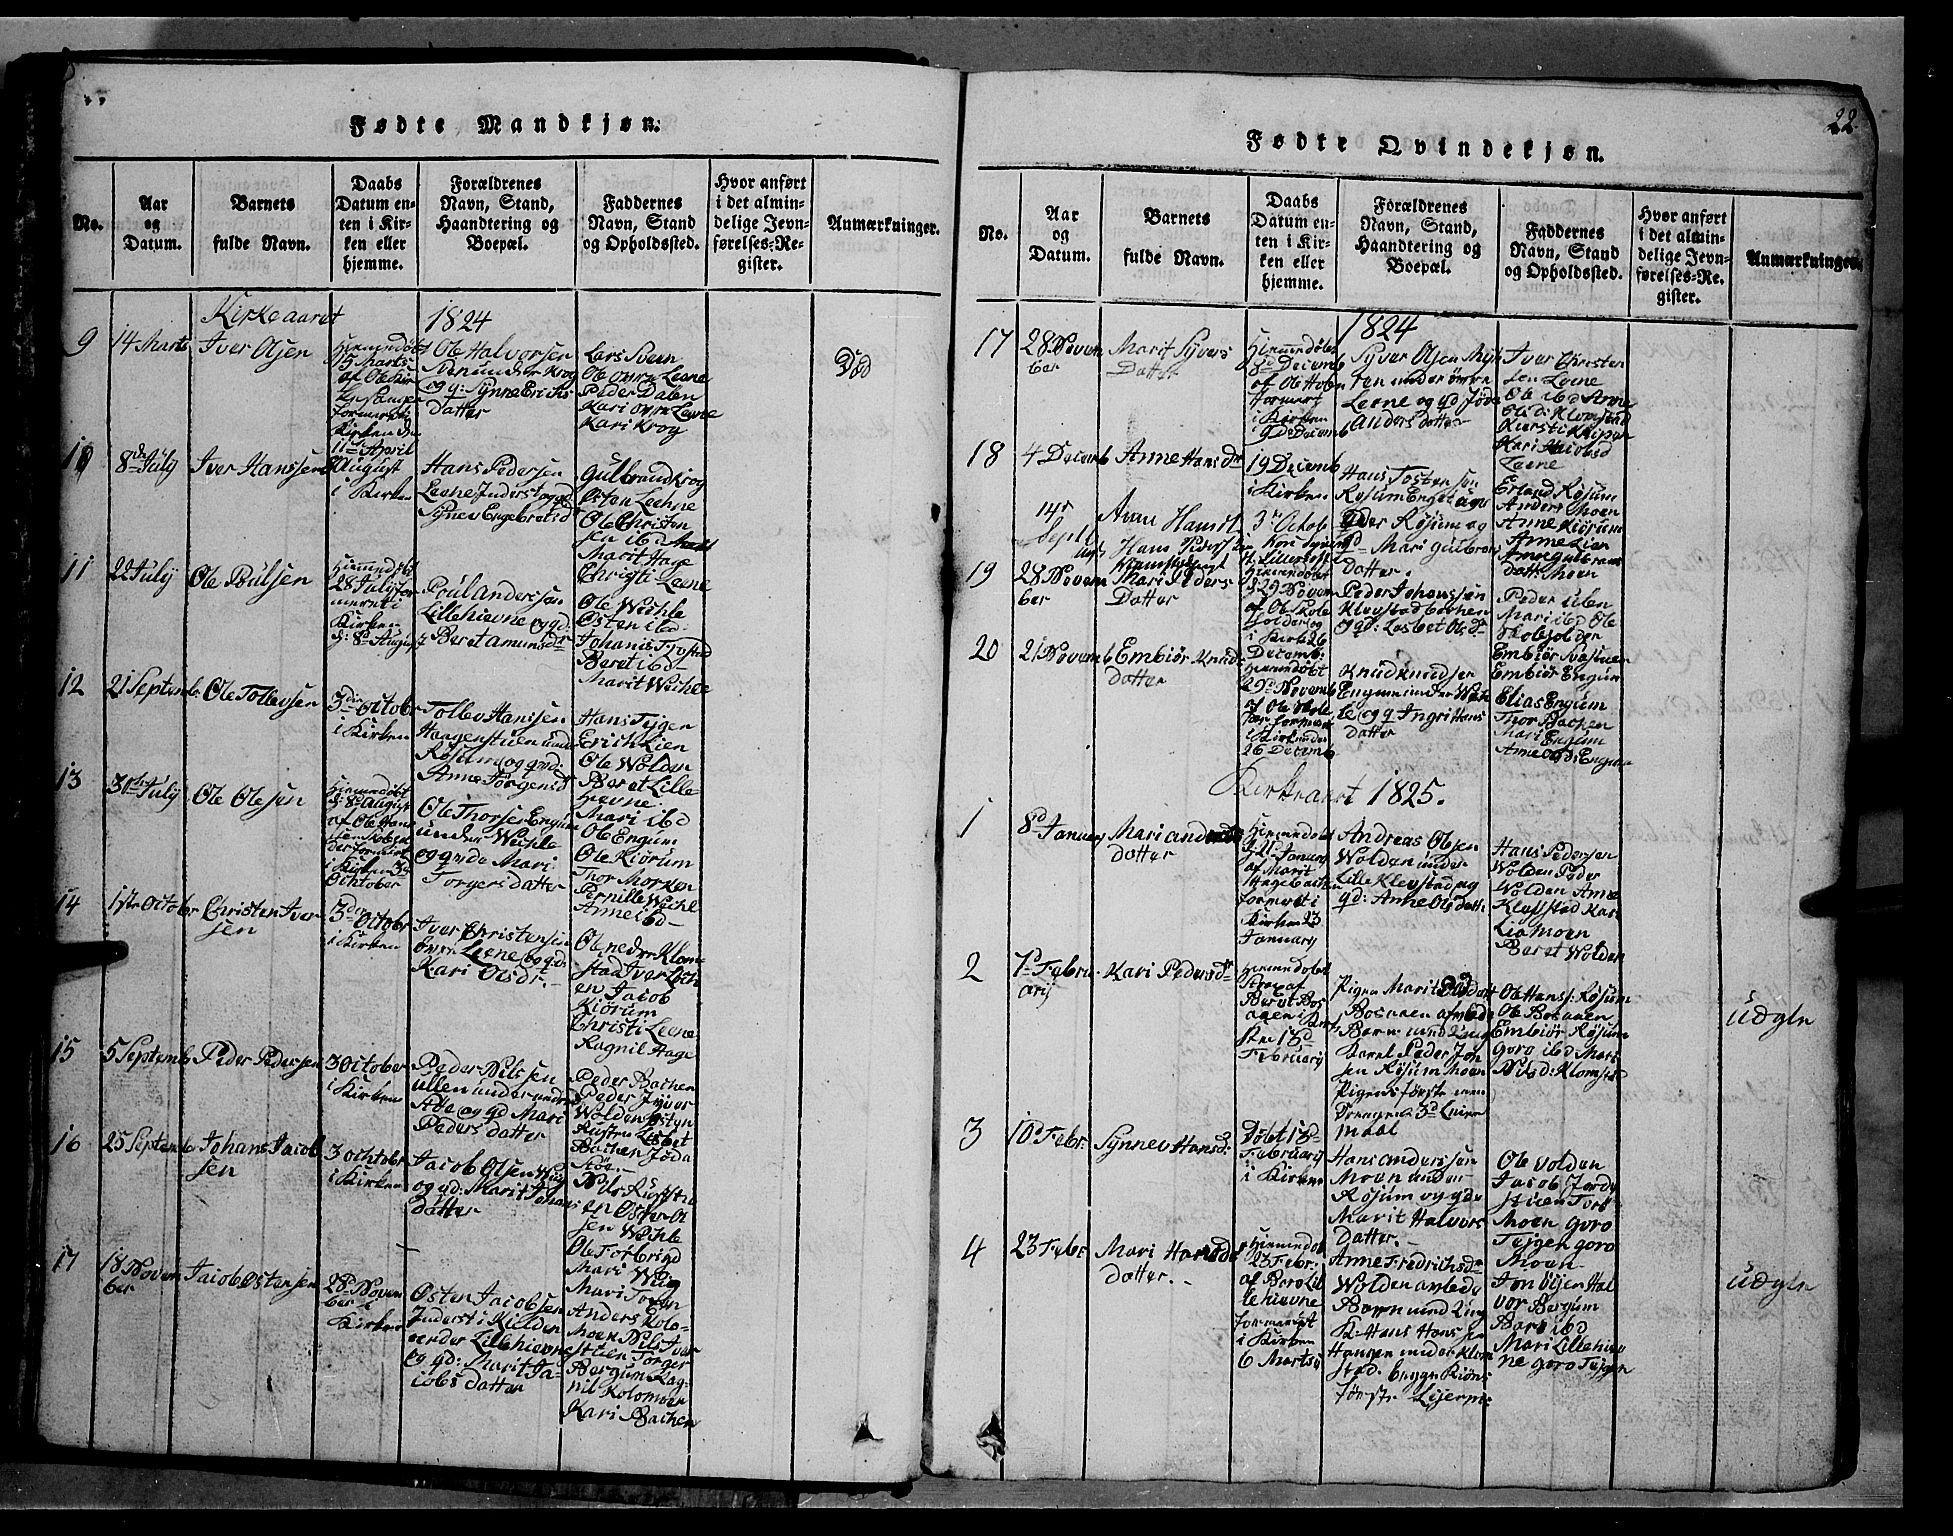 SAH, Fron prestekontor, H/Ha/Hab/L0002: Klokkerbok nr. 2, 1816-1850, s. 22